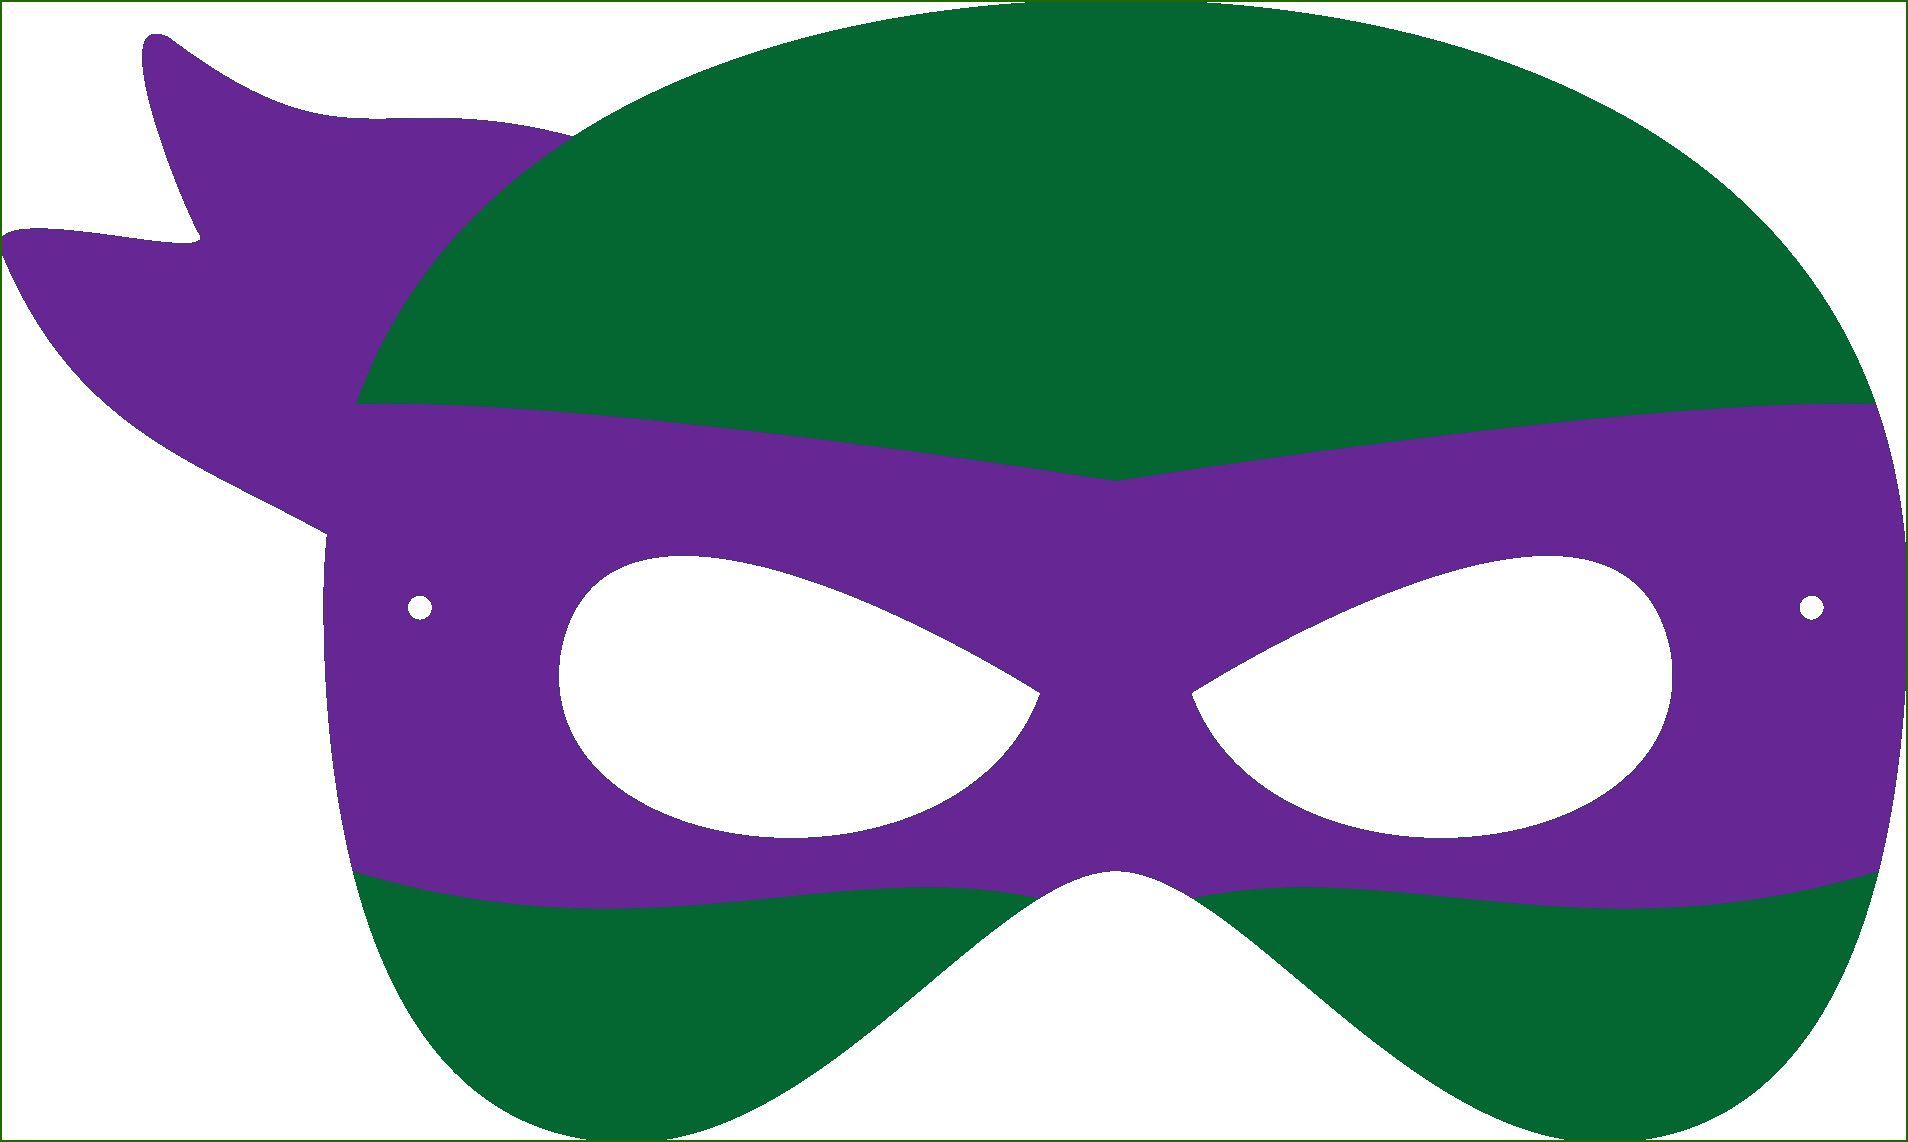 19 Awe Inspiring Ninja Turtle Mask Template In 2020 Ninja Turtle Mask Ninja Turtles Birthday Party Ninja Turtles